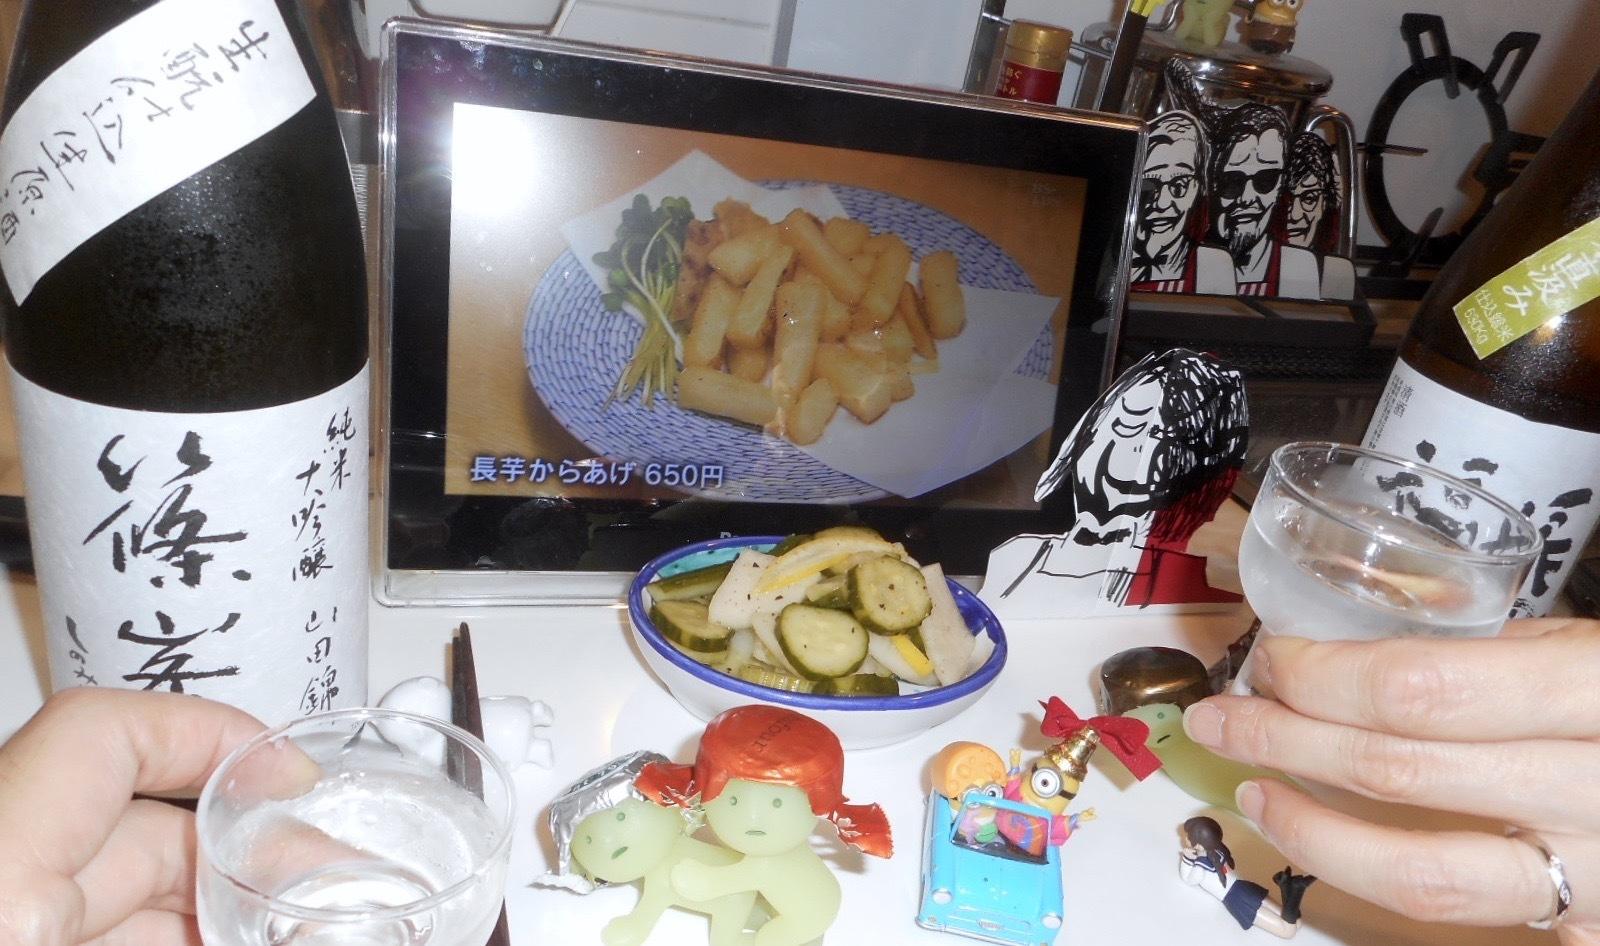 shinomine_kimoto_jundai29by3.jpg